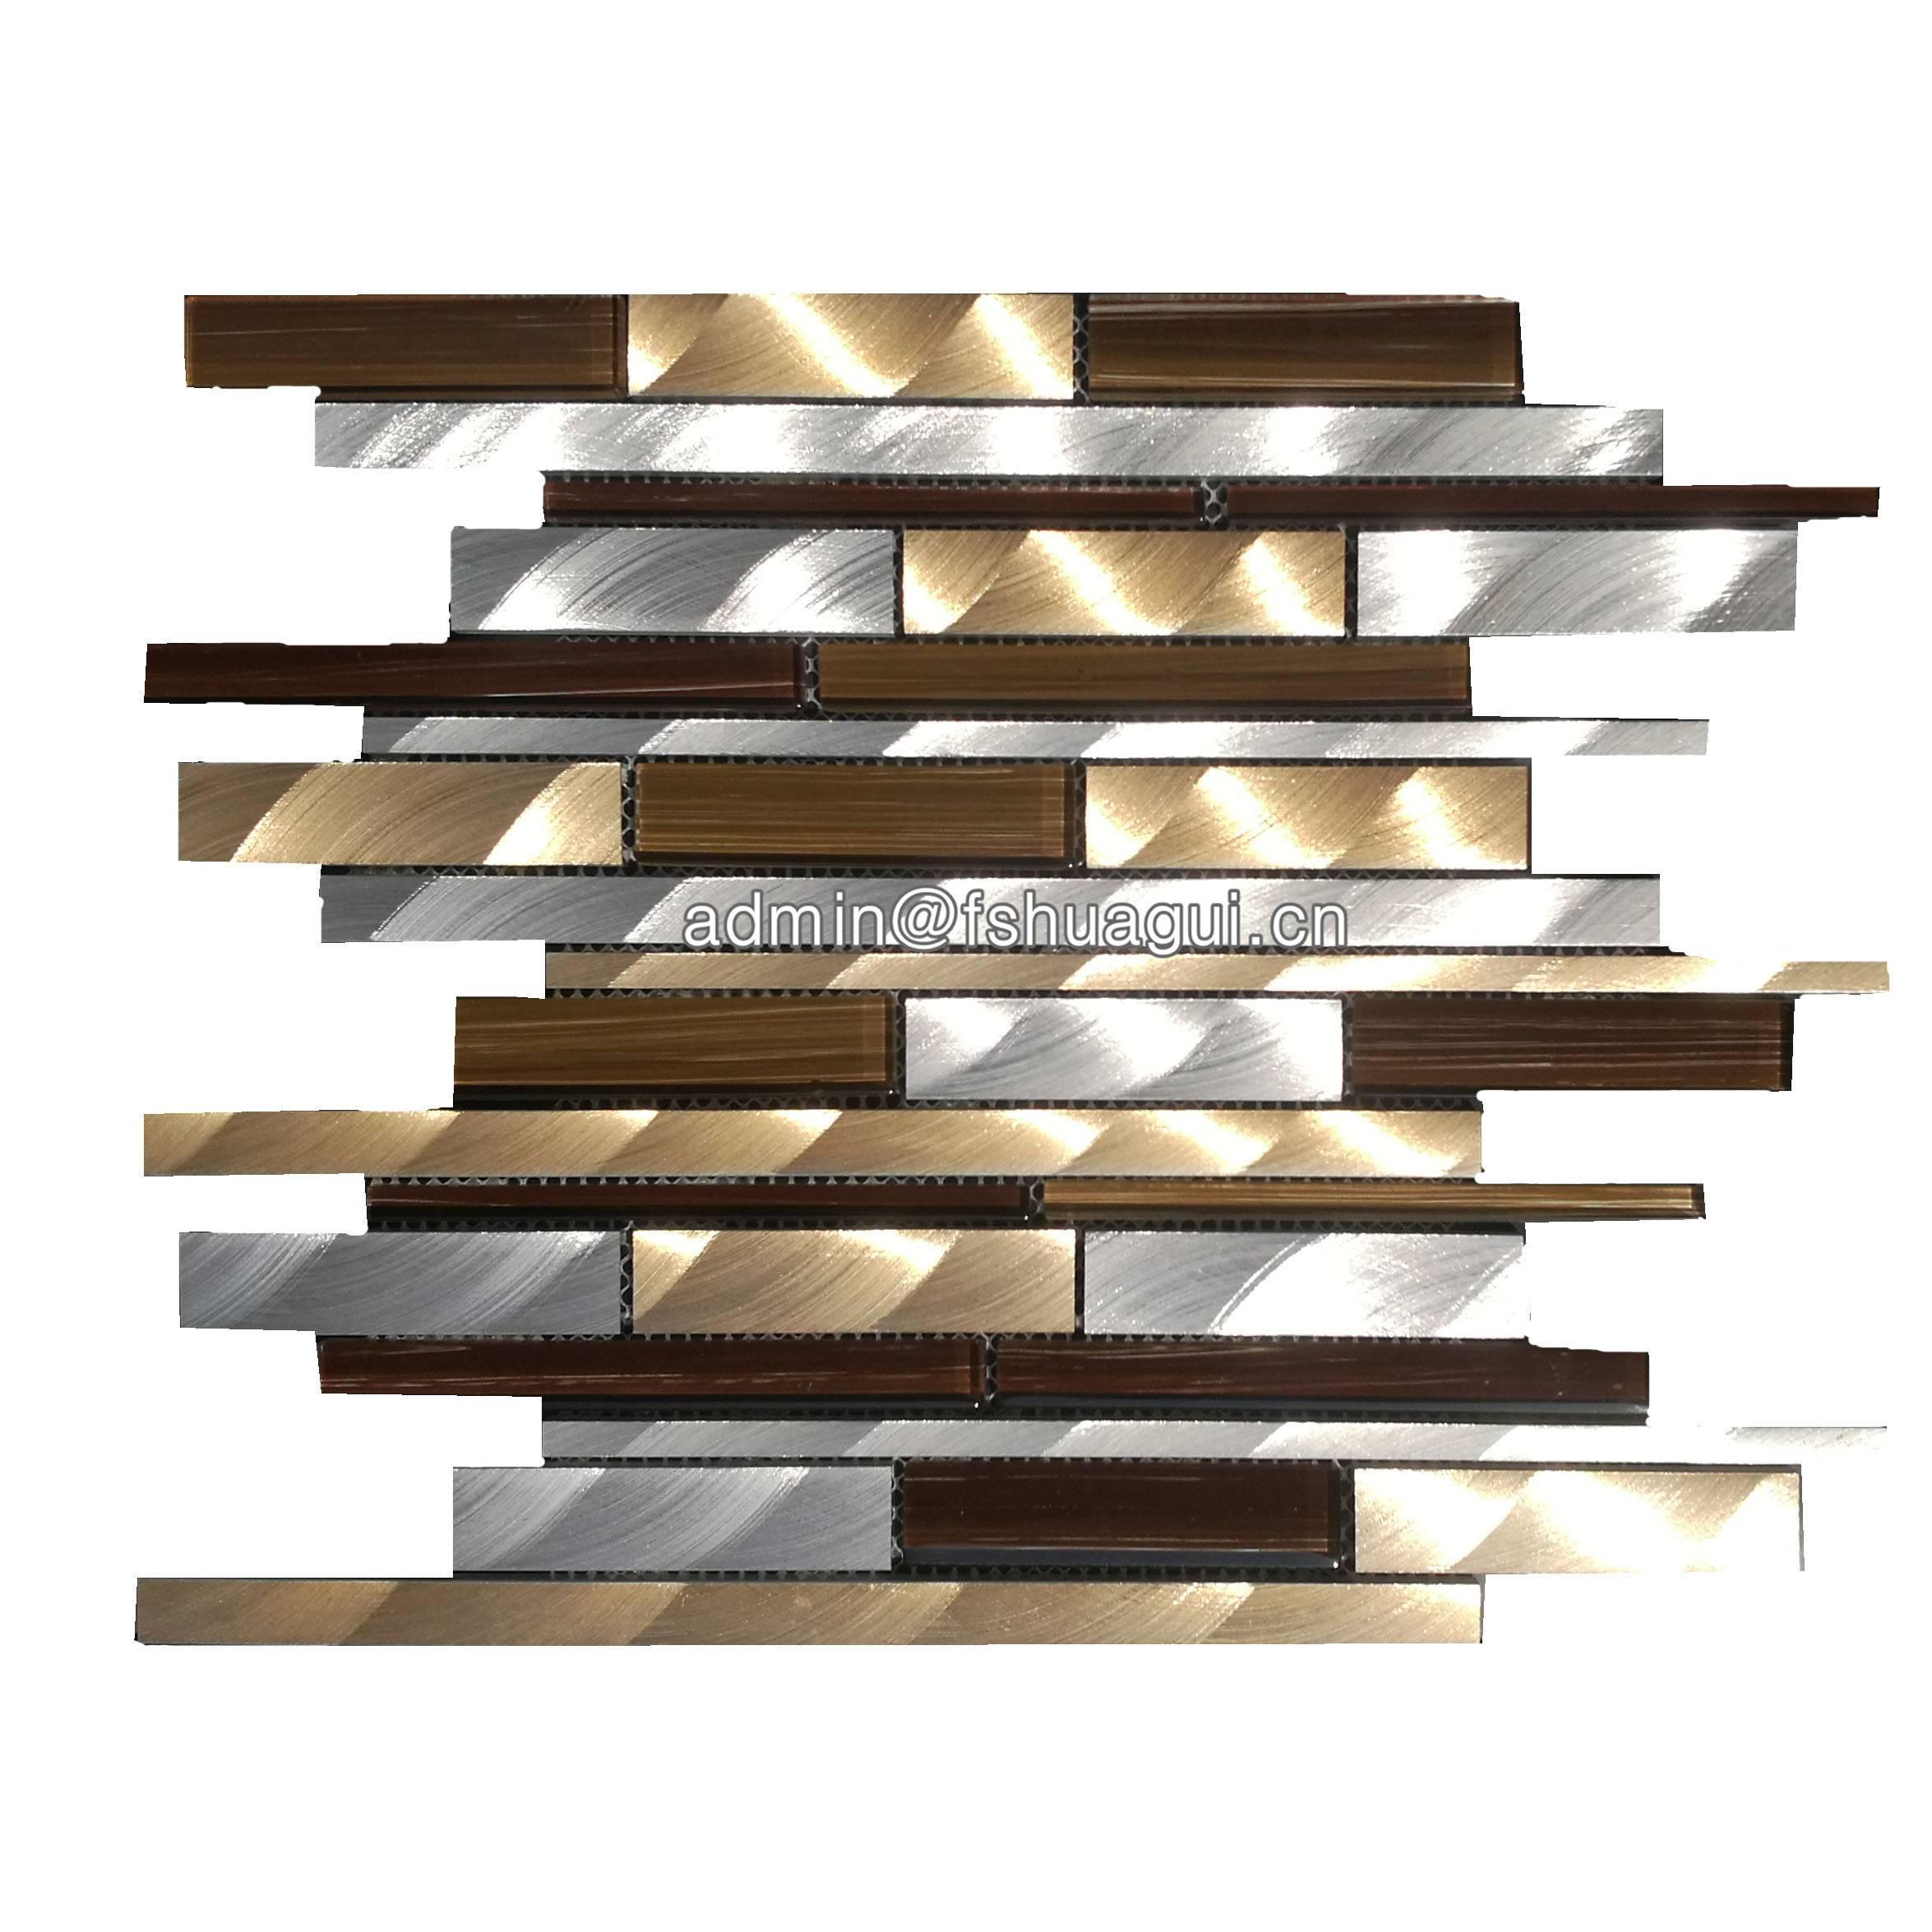 Huagui Brushed golden silver aluminium metal mosaic tiles UK HG-WJ414 METAL MOSAIC TILE image2